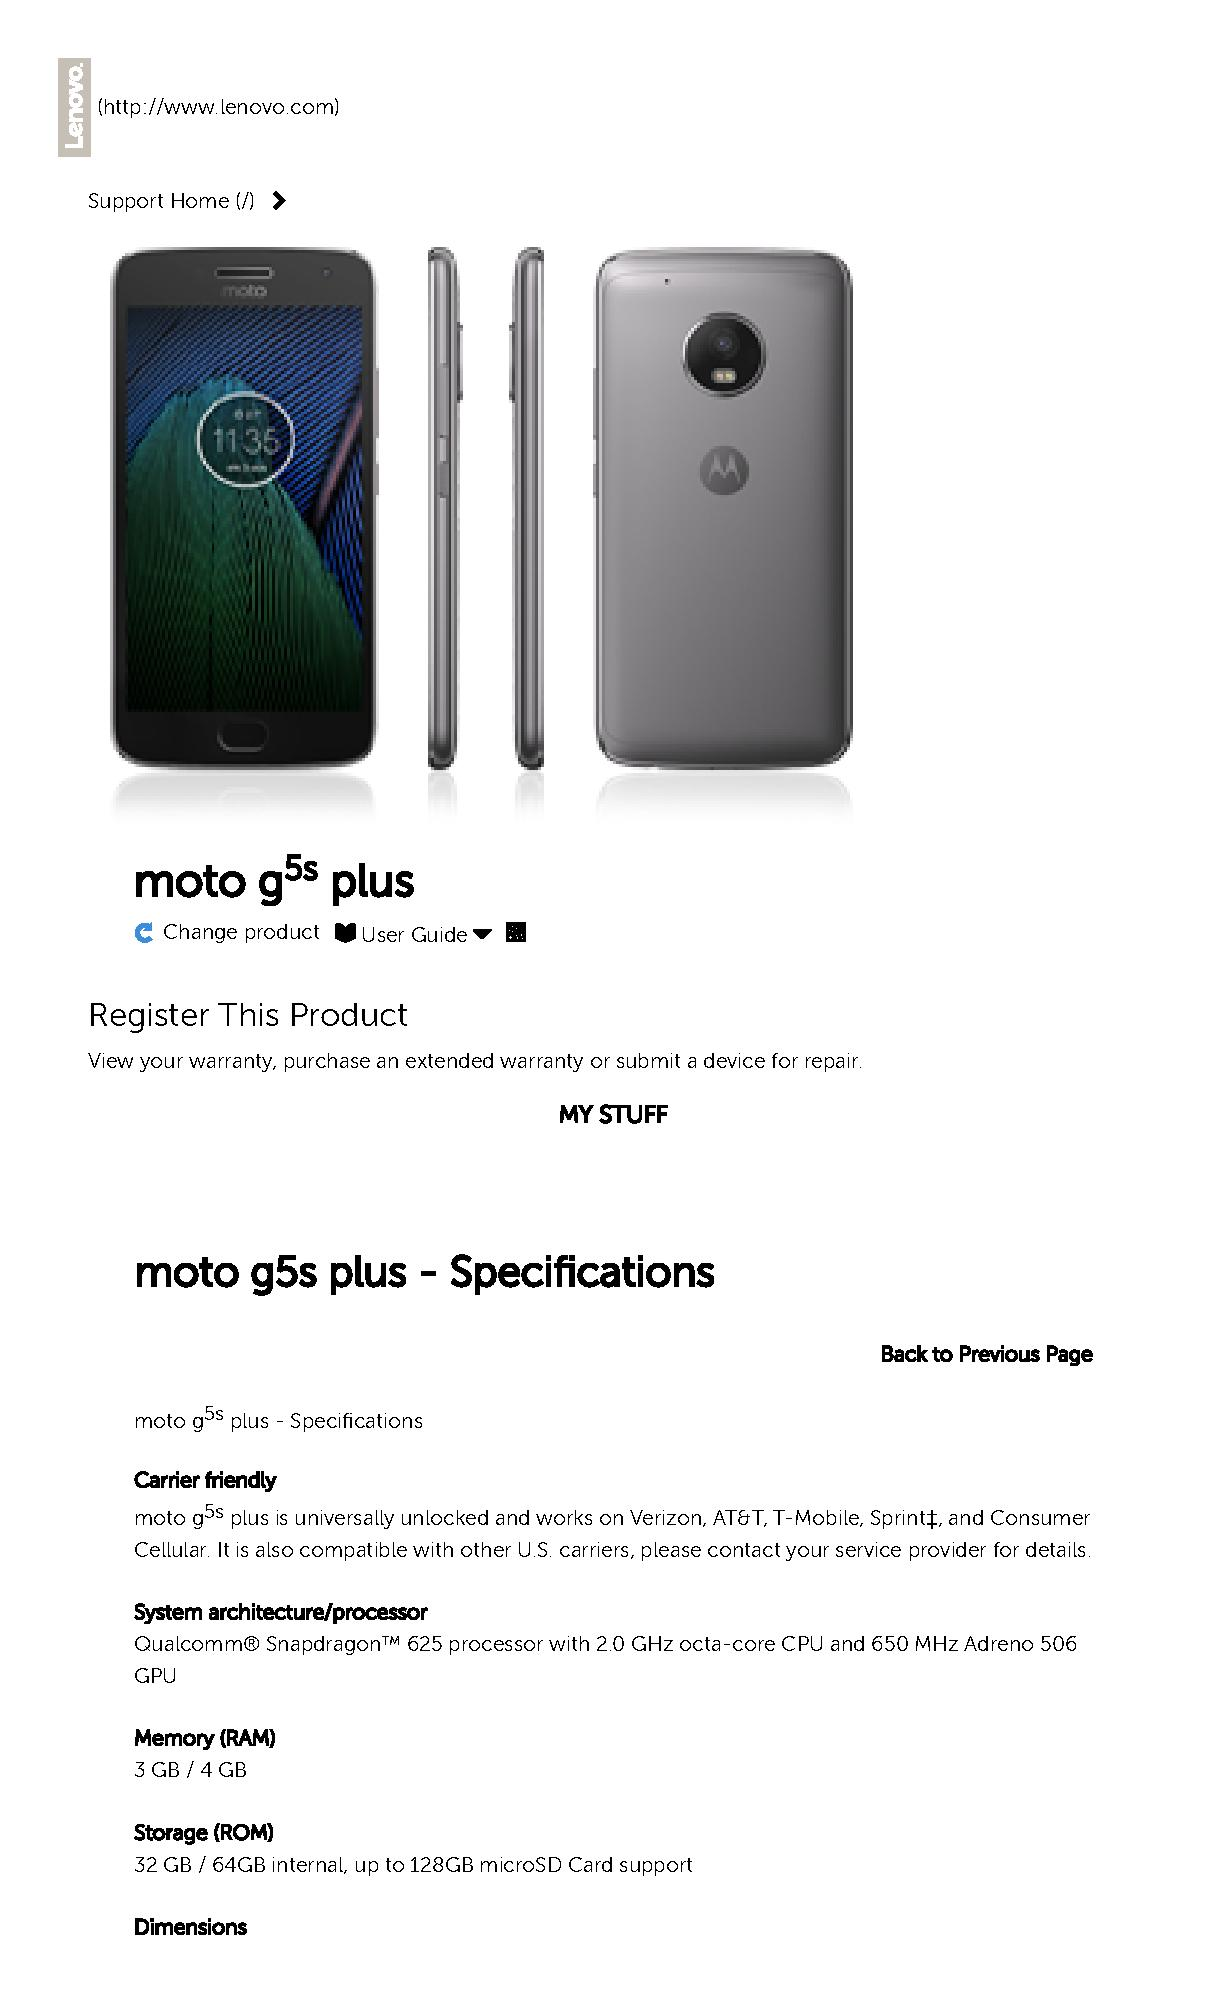 moto g5s plus - Specifications - Motorola Support - US.pdf | PDF Host